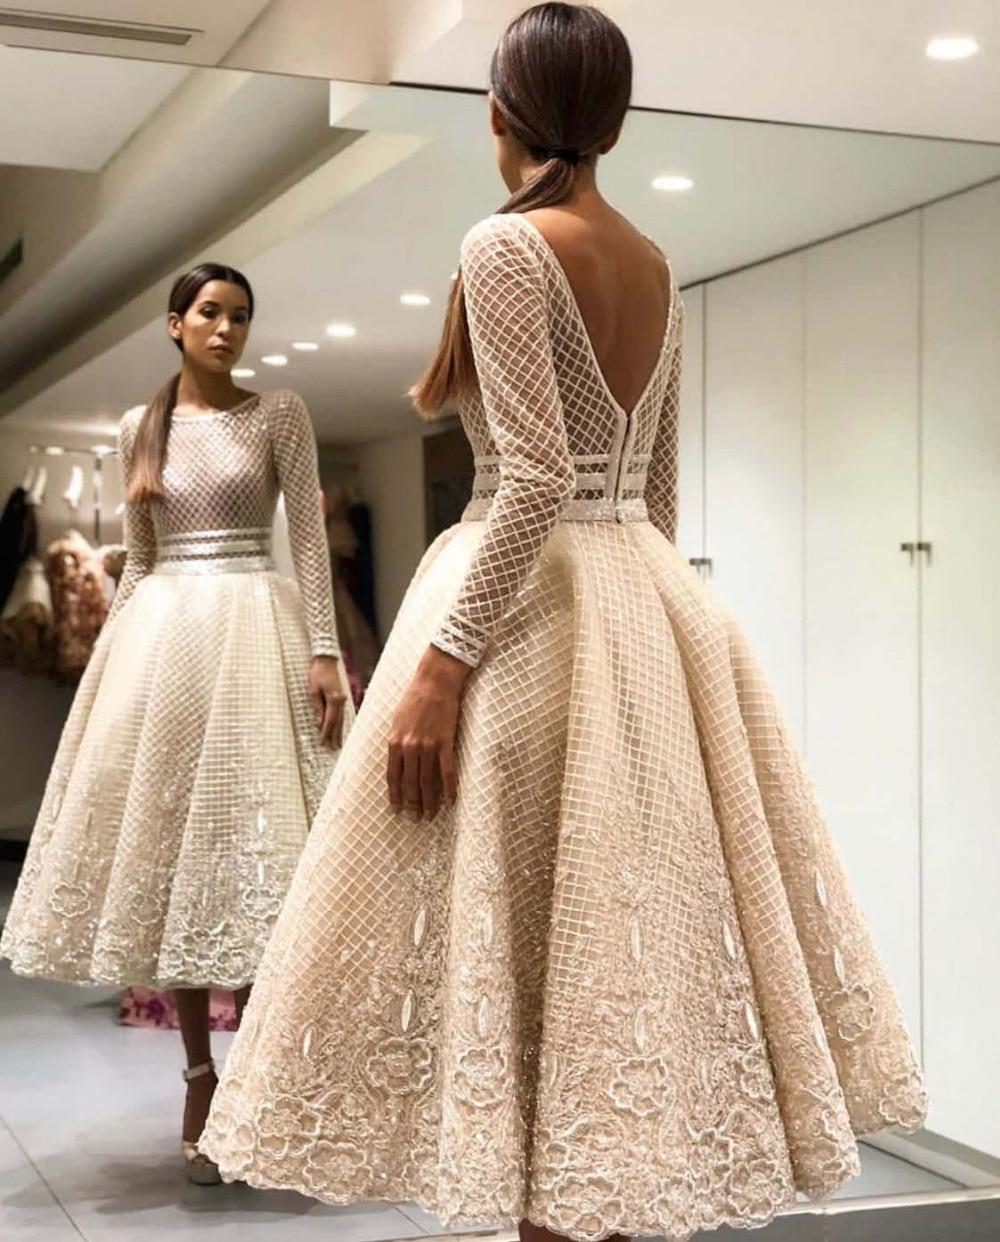 Elegant Bige Color Unique Lace Cocktail Dresses Full Sleeves V-Back Ankle Length Prom Gowns 2019 Robe De Soiree Party Dresses